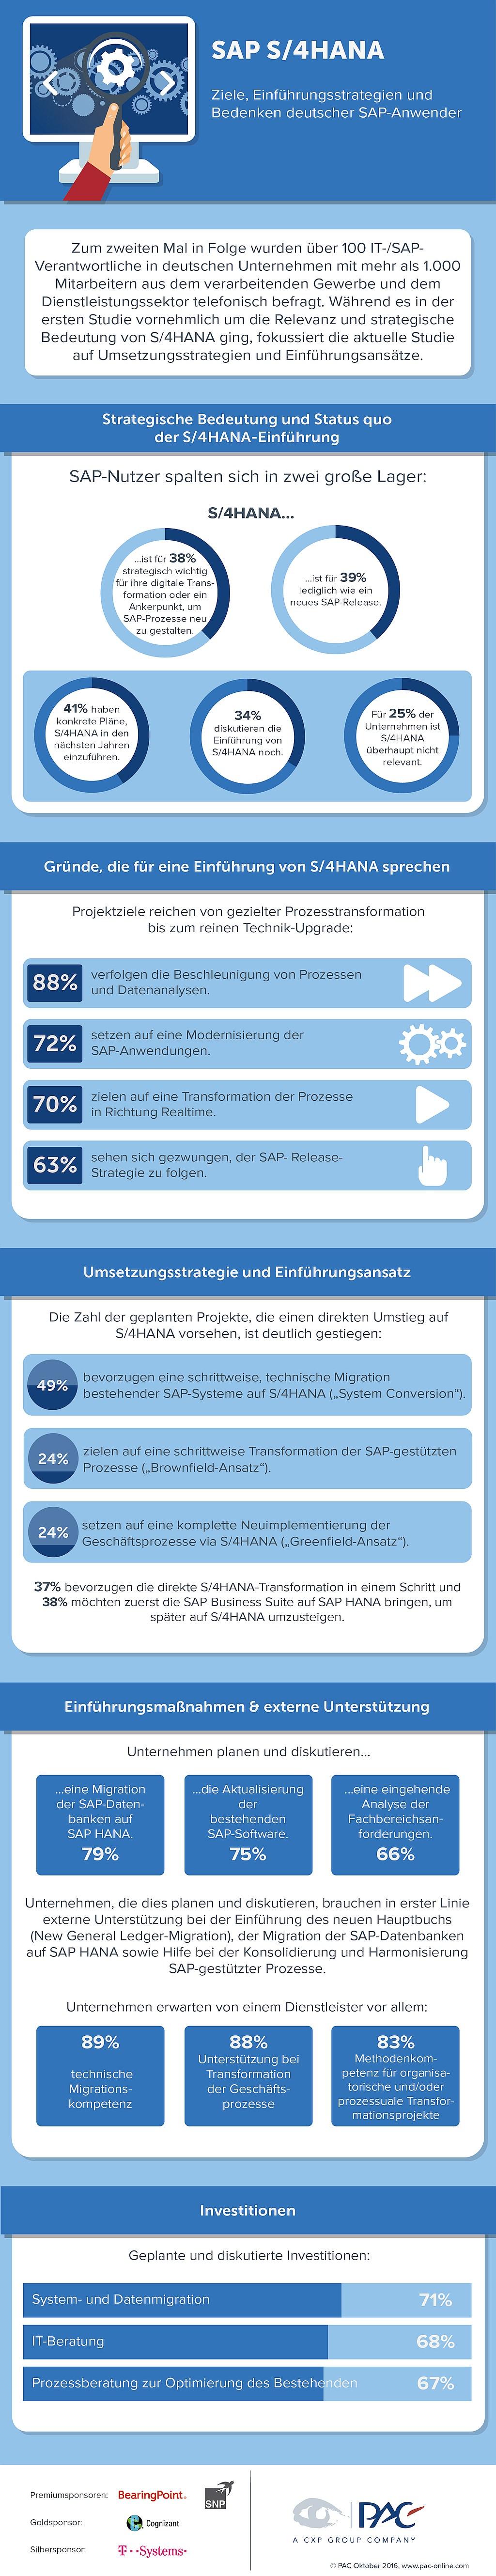 infografik-pac-mcs-sap_s4_hana_2016